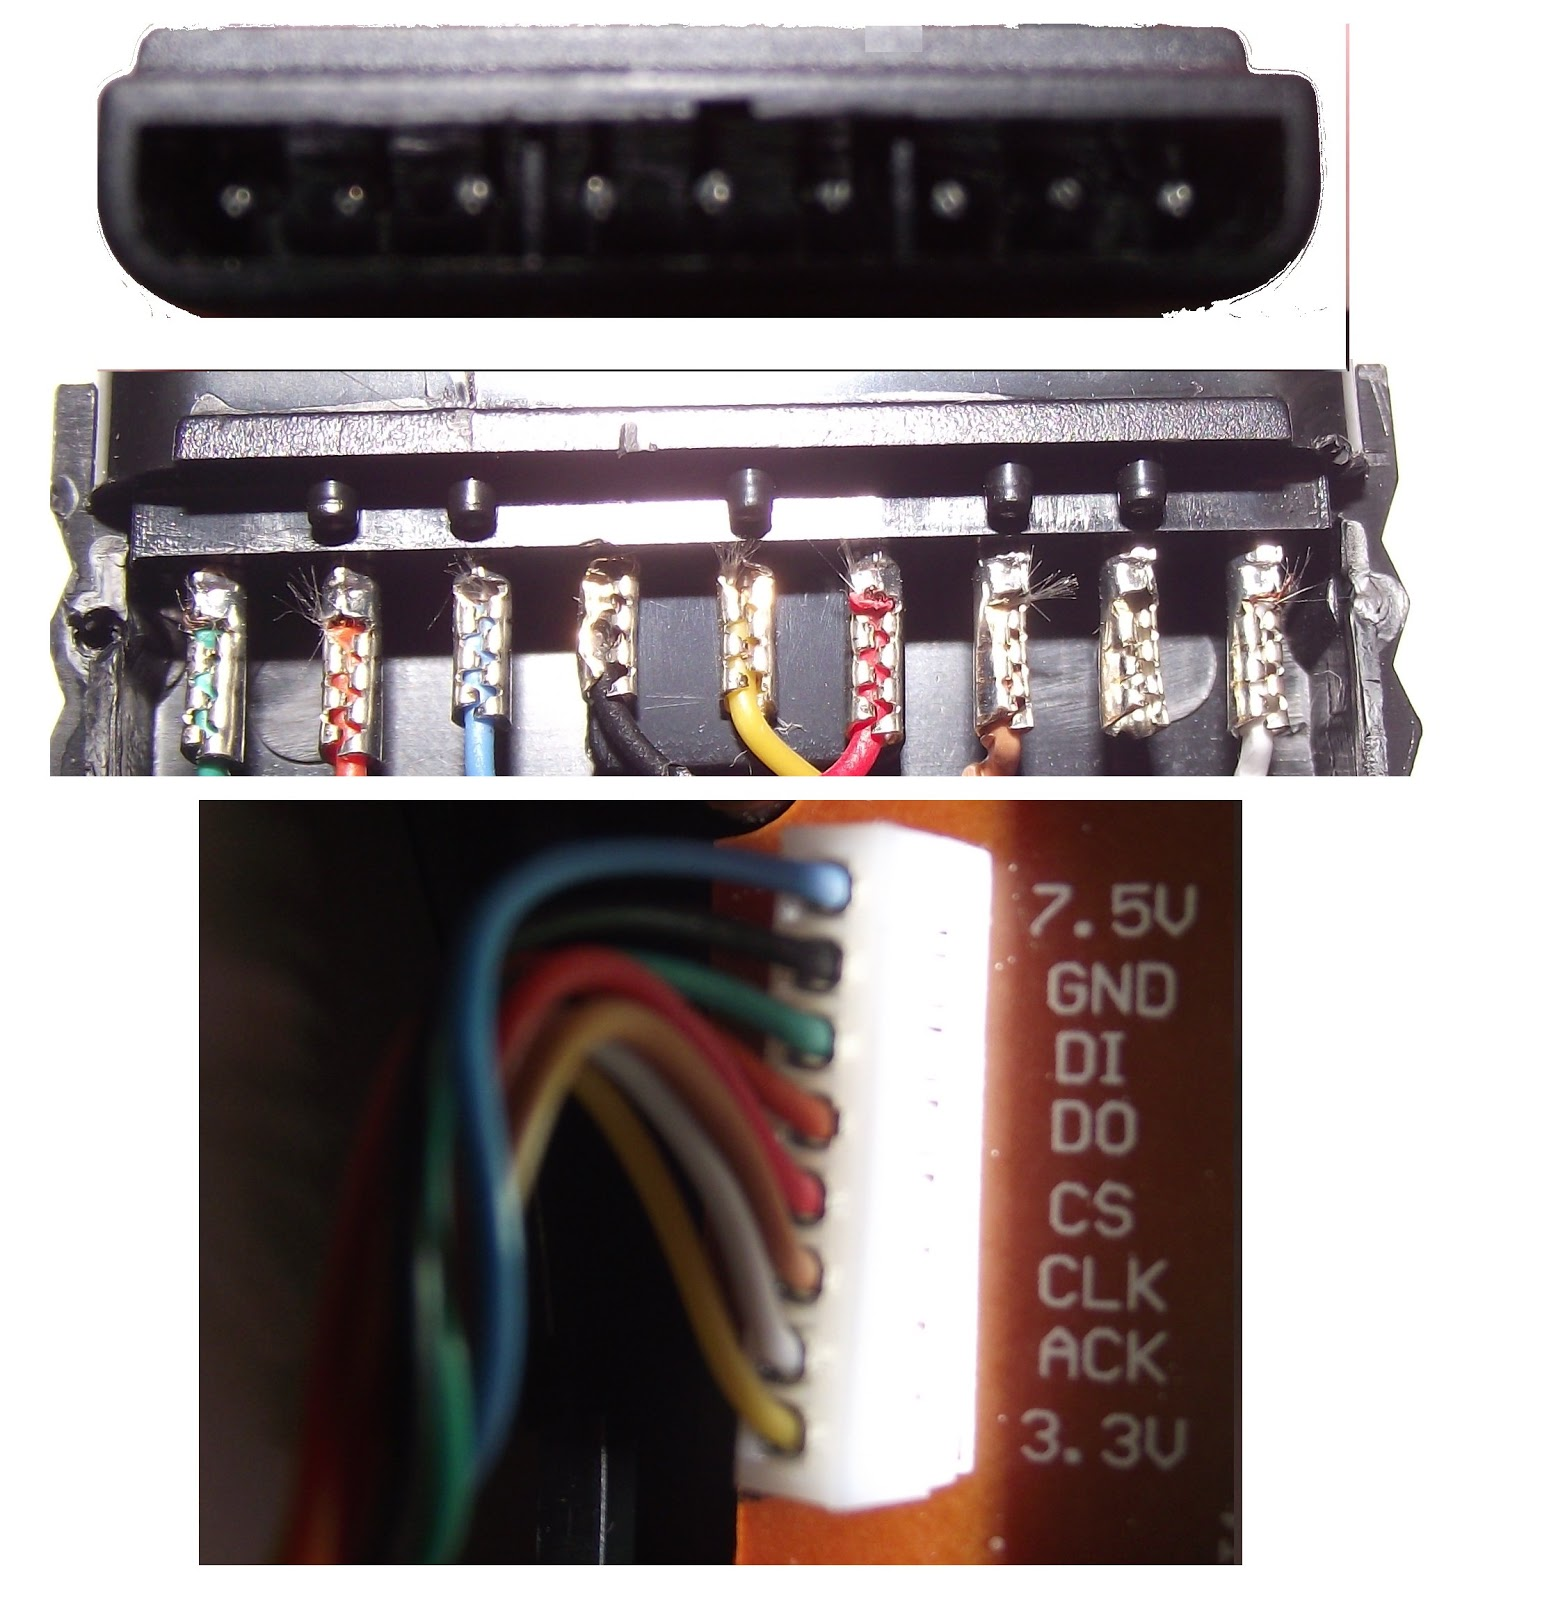 medium resolution of playstation 2 controller to usb wiring diagram wiring diagramdigitalduino interfacing a playstation 2 ps2